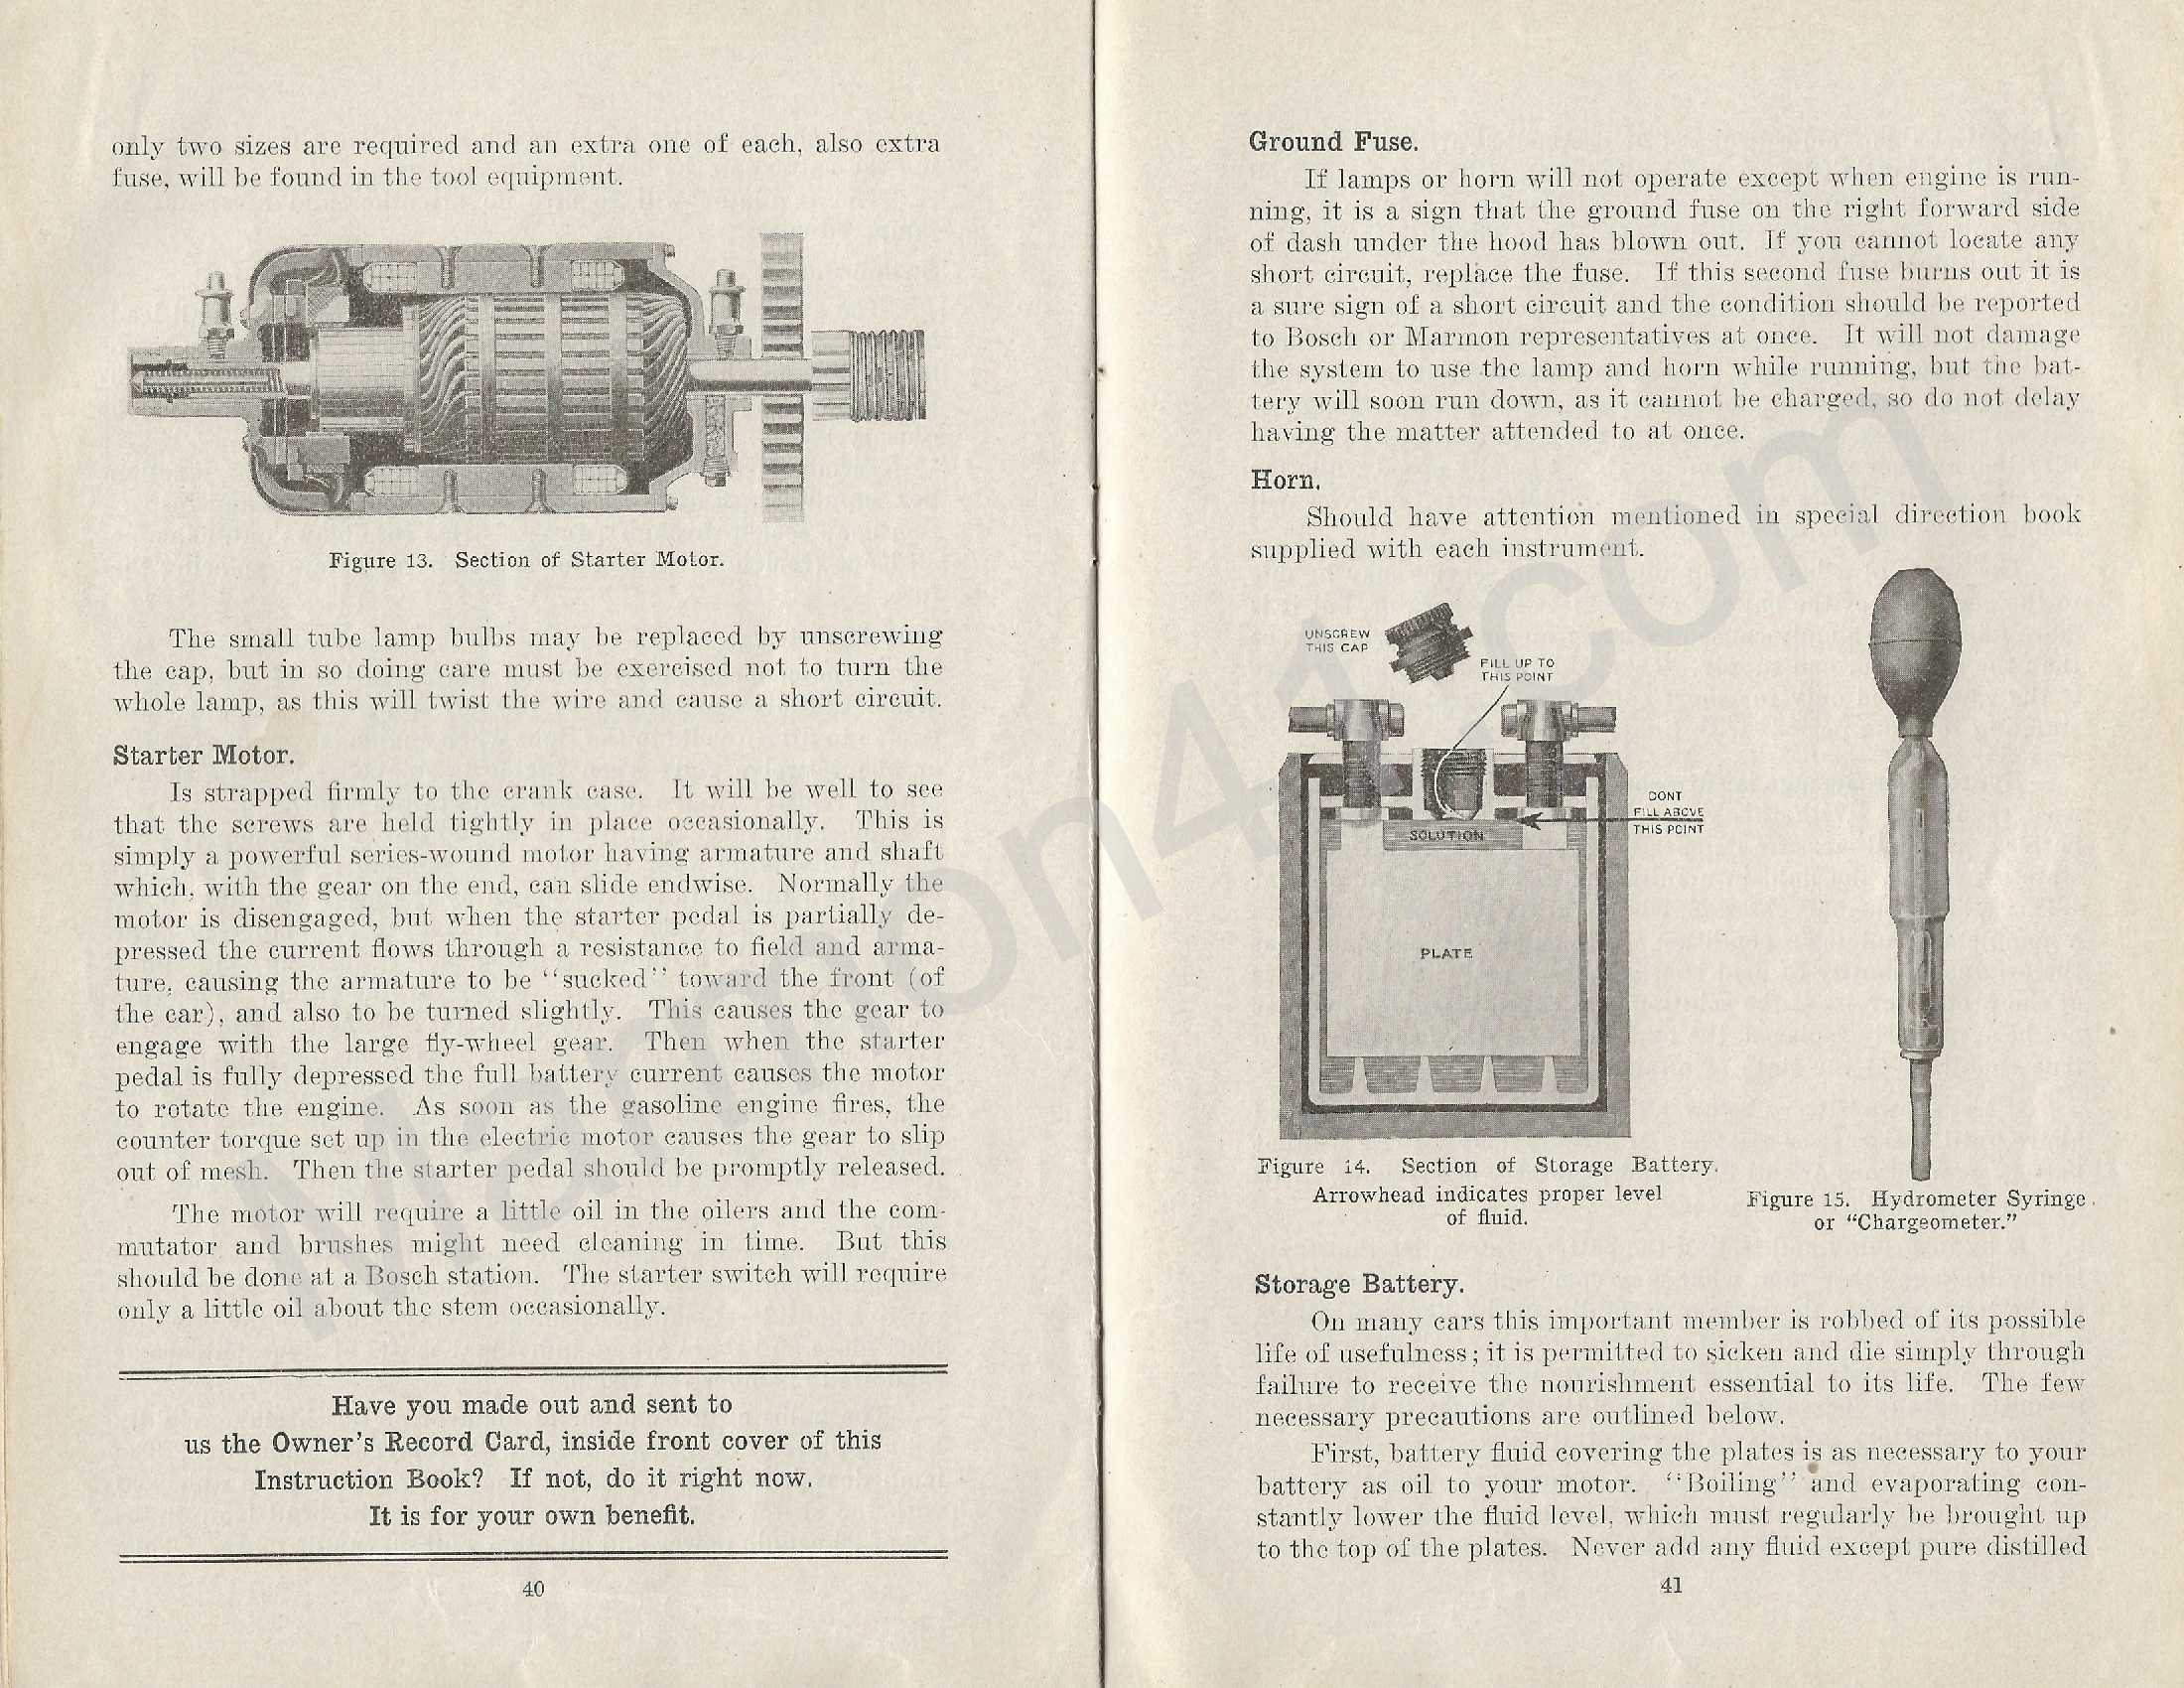 1915-07-01_Marmon41_Info_Book_1534-B_22